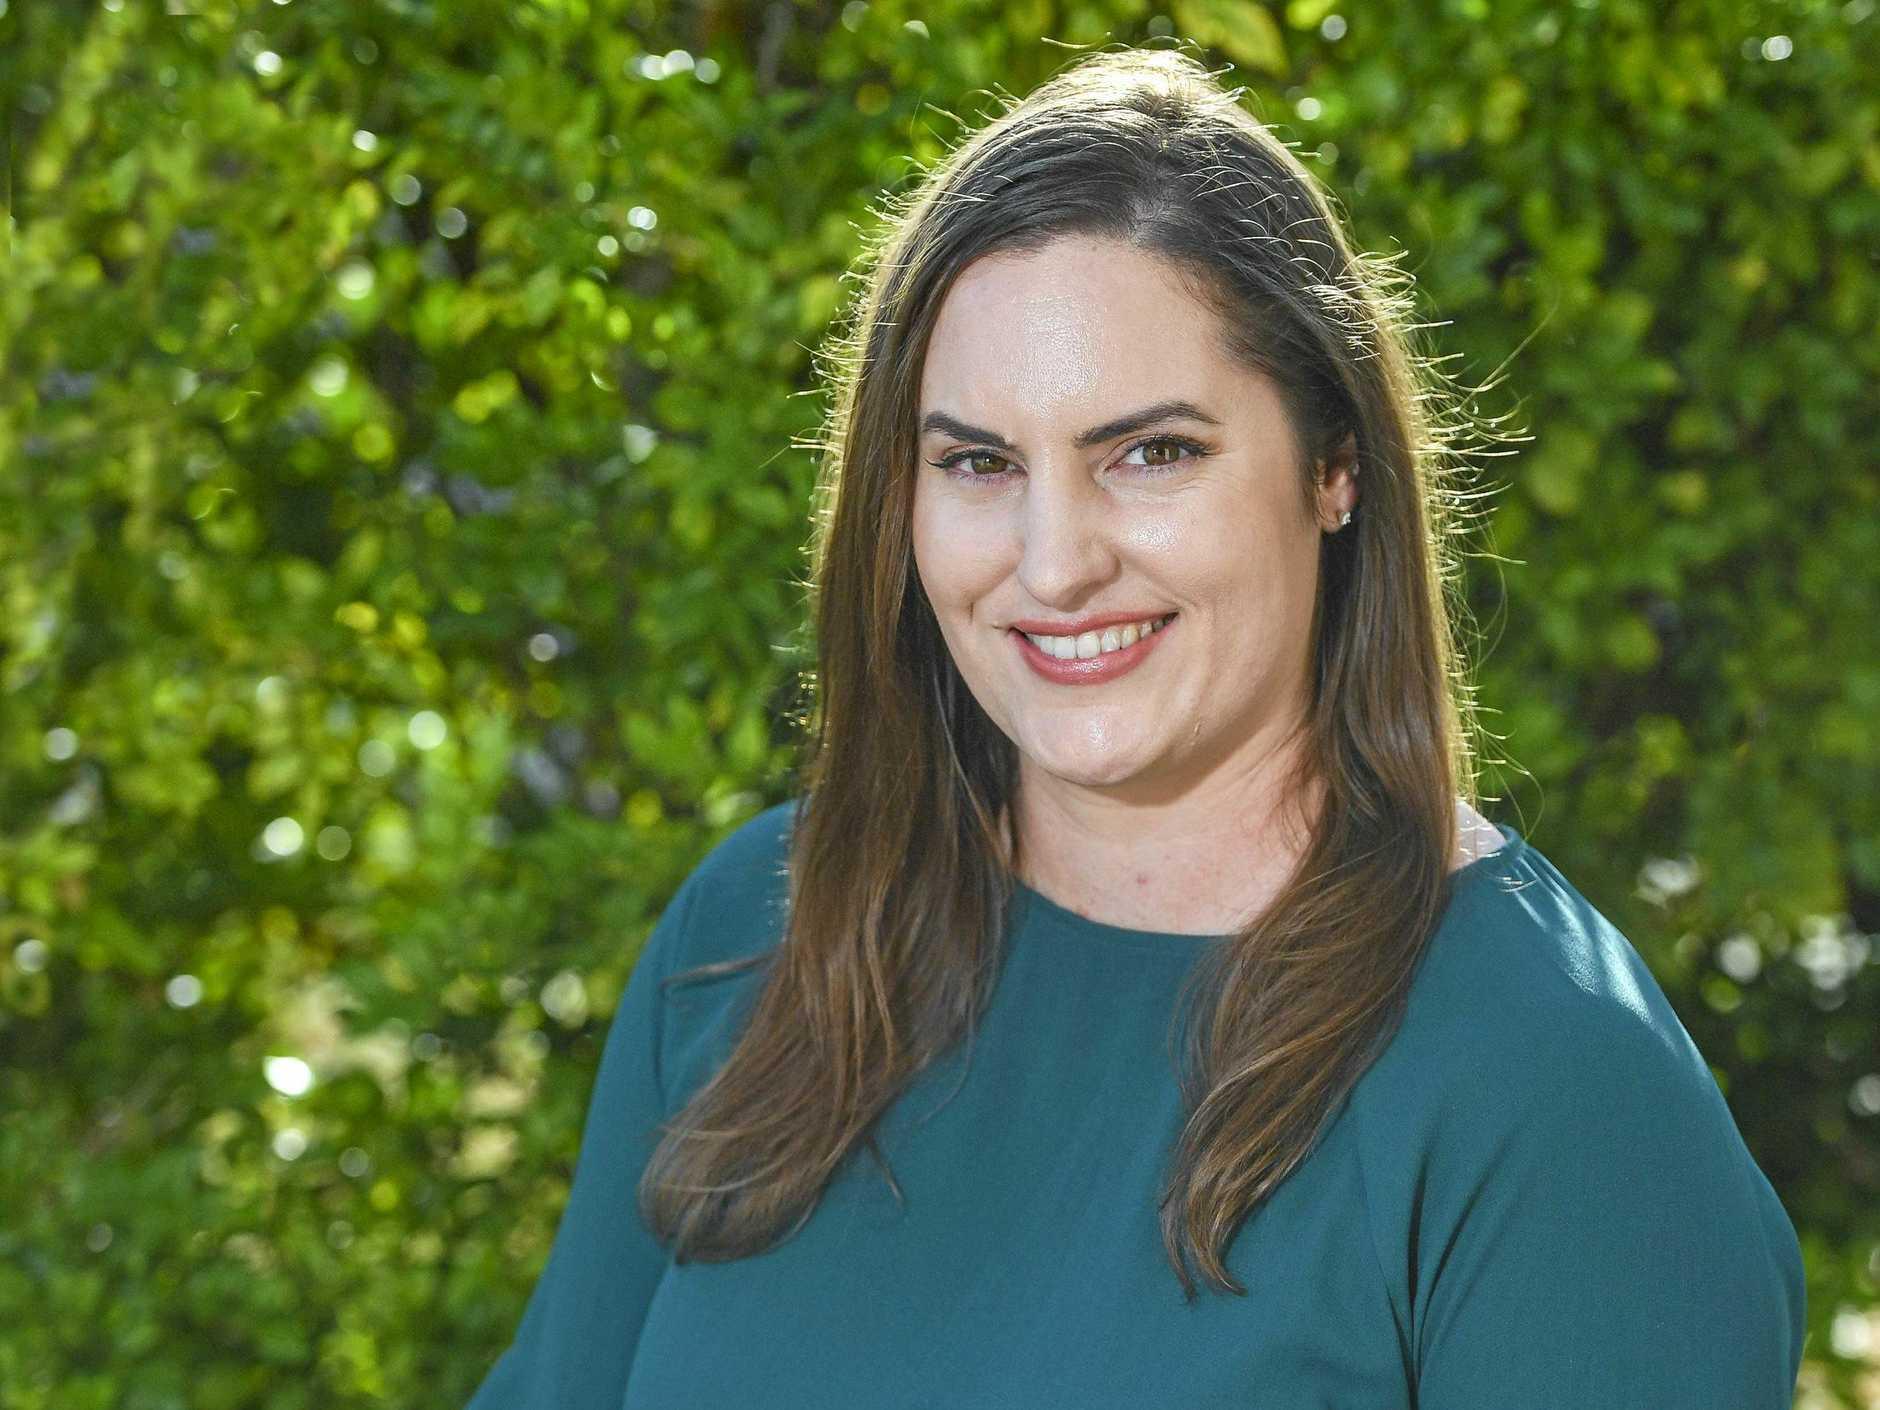 Megan Sheehan - Editor, The Observer